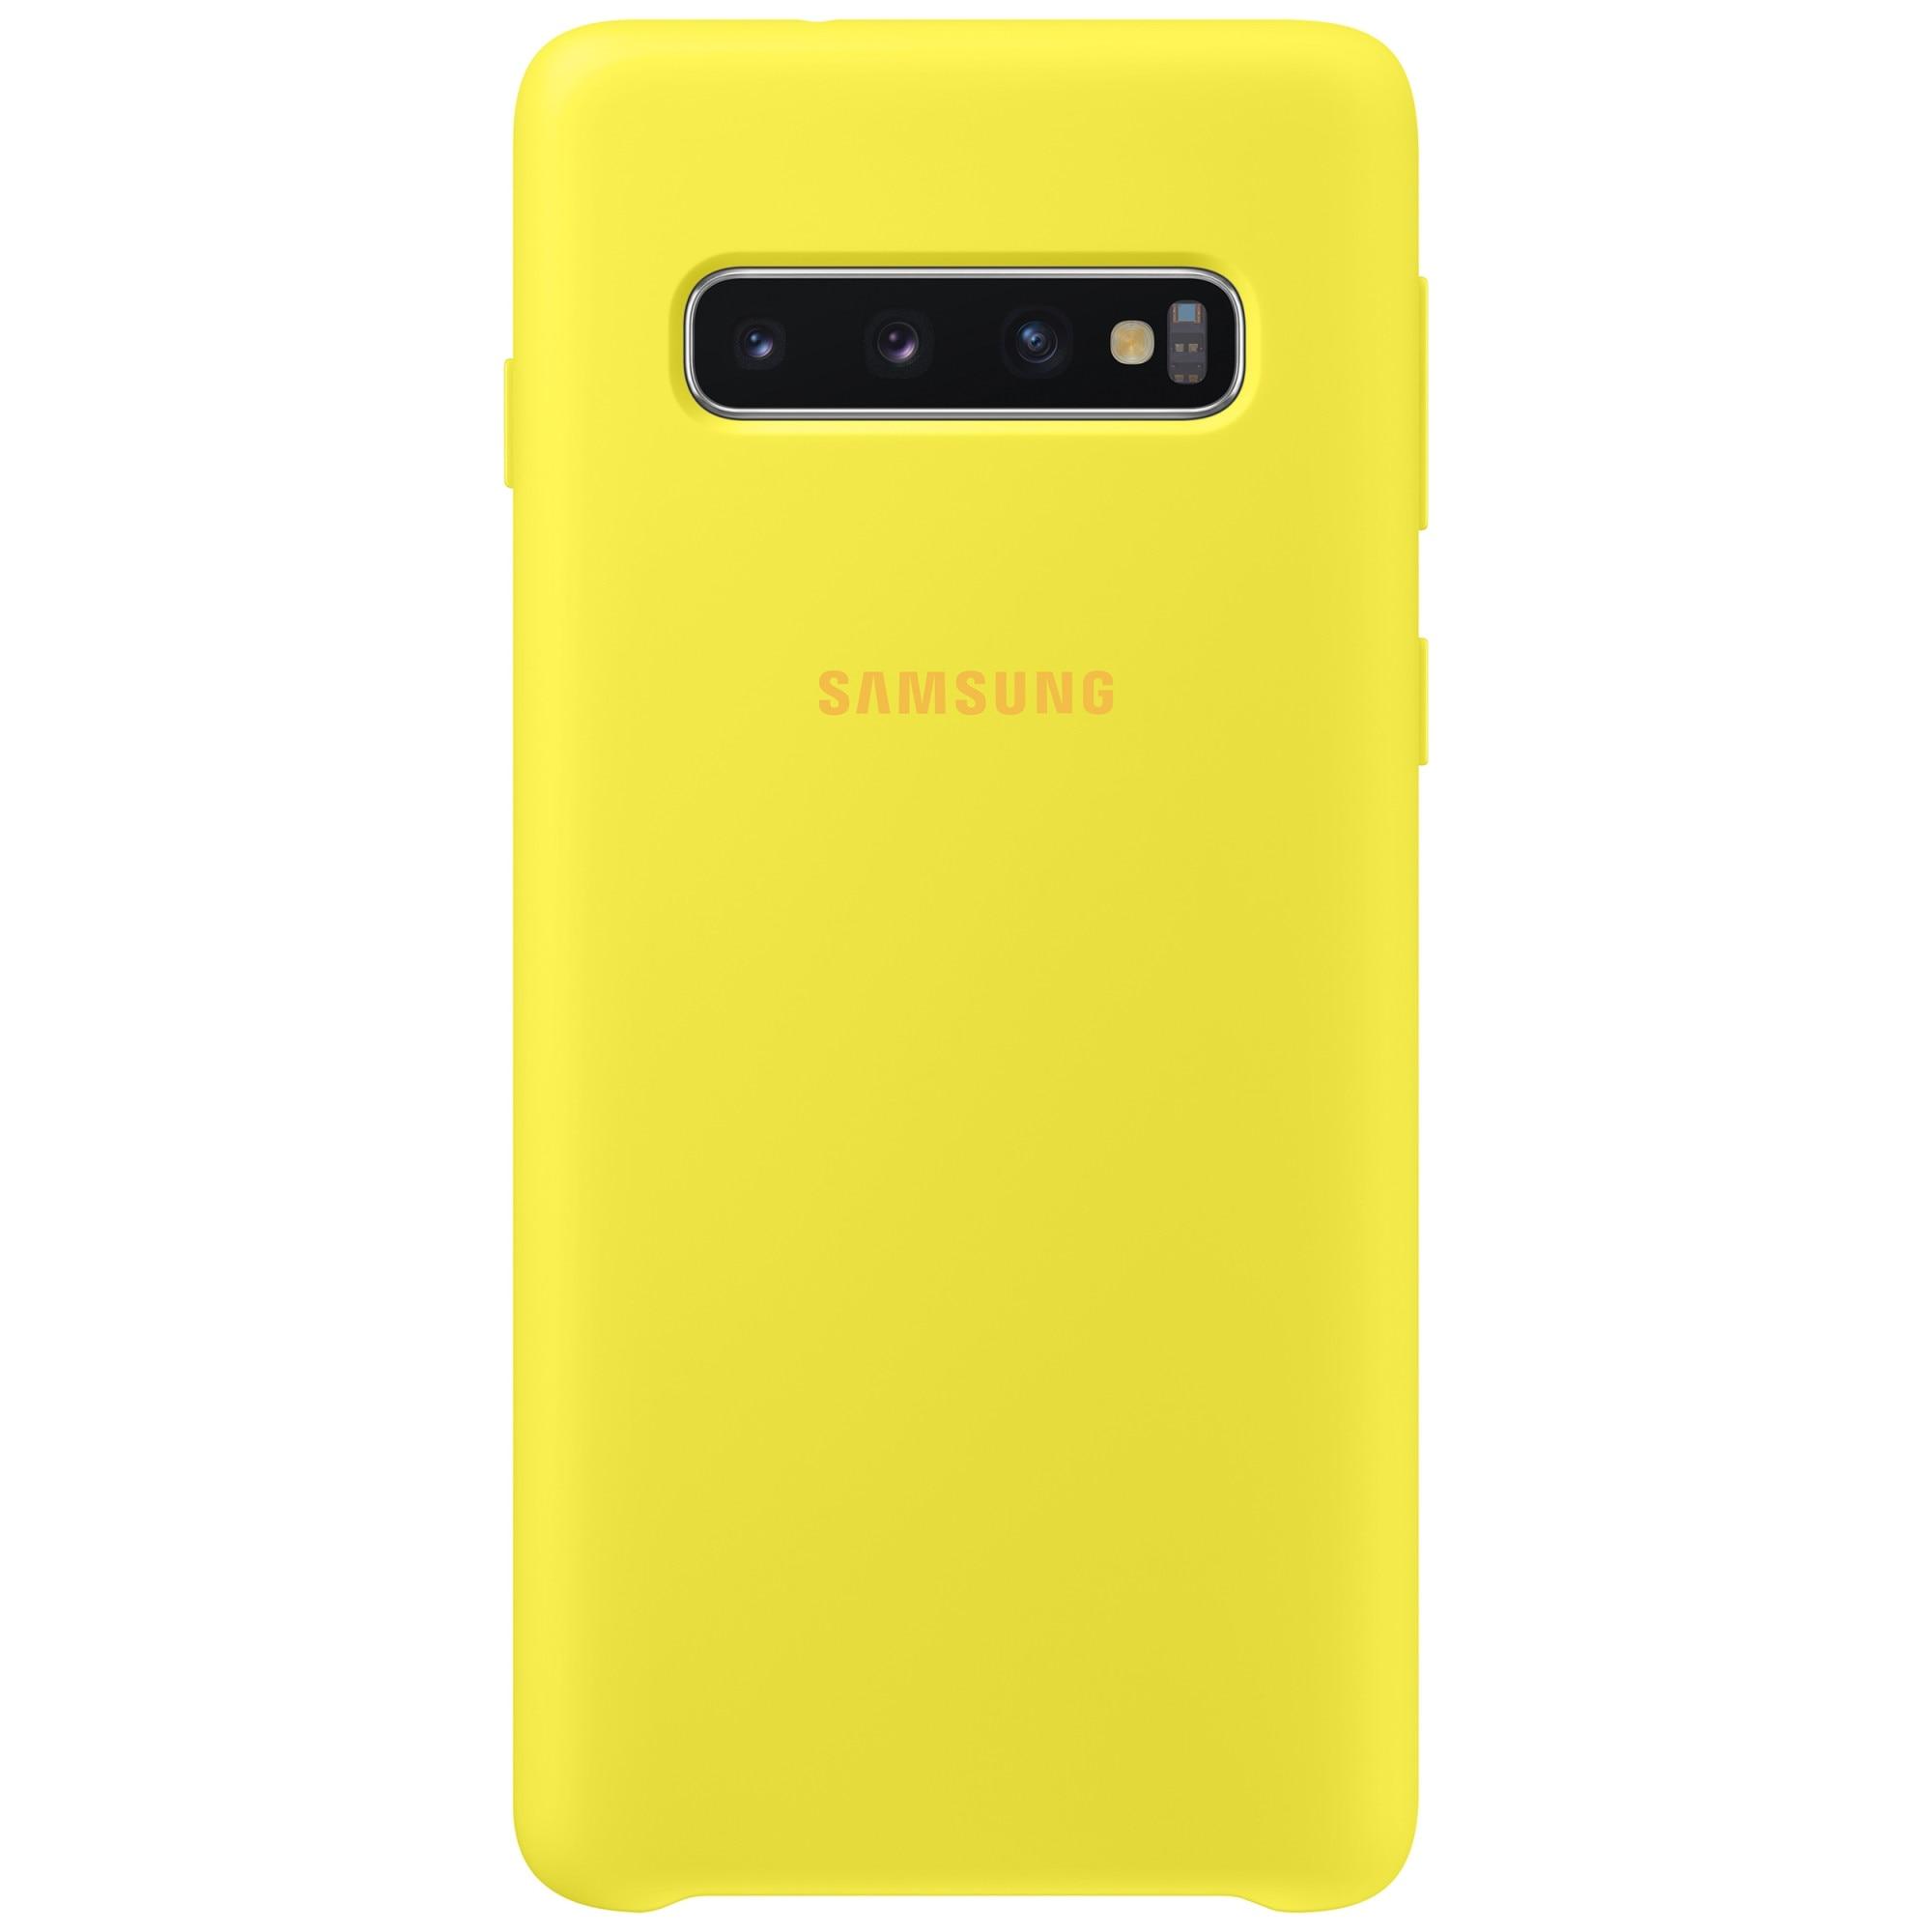 Fotografie Husa de protectie Samsung Silicone pentru Galaxy S10 G973, Yellow